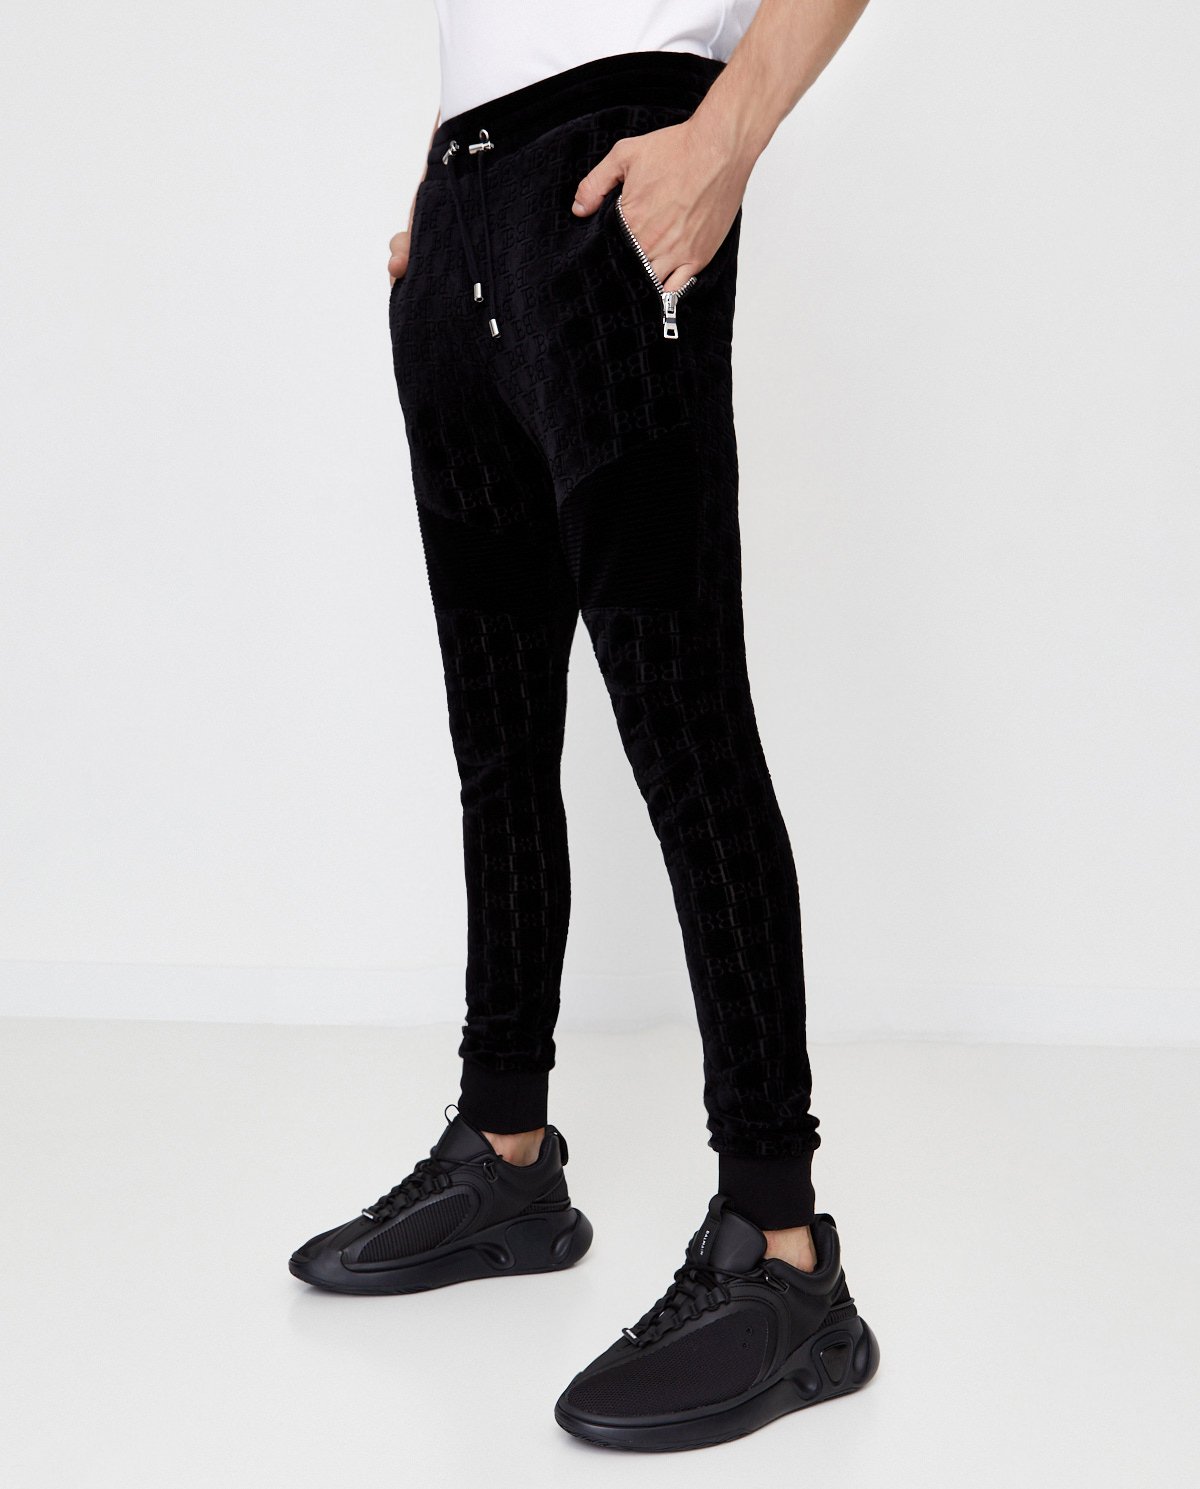 Spodnie dresowe z monogramem Balmain UH15463I366 0PA